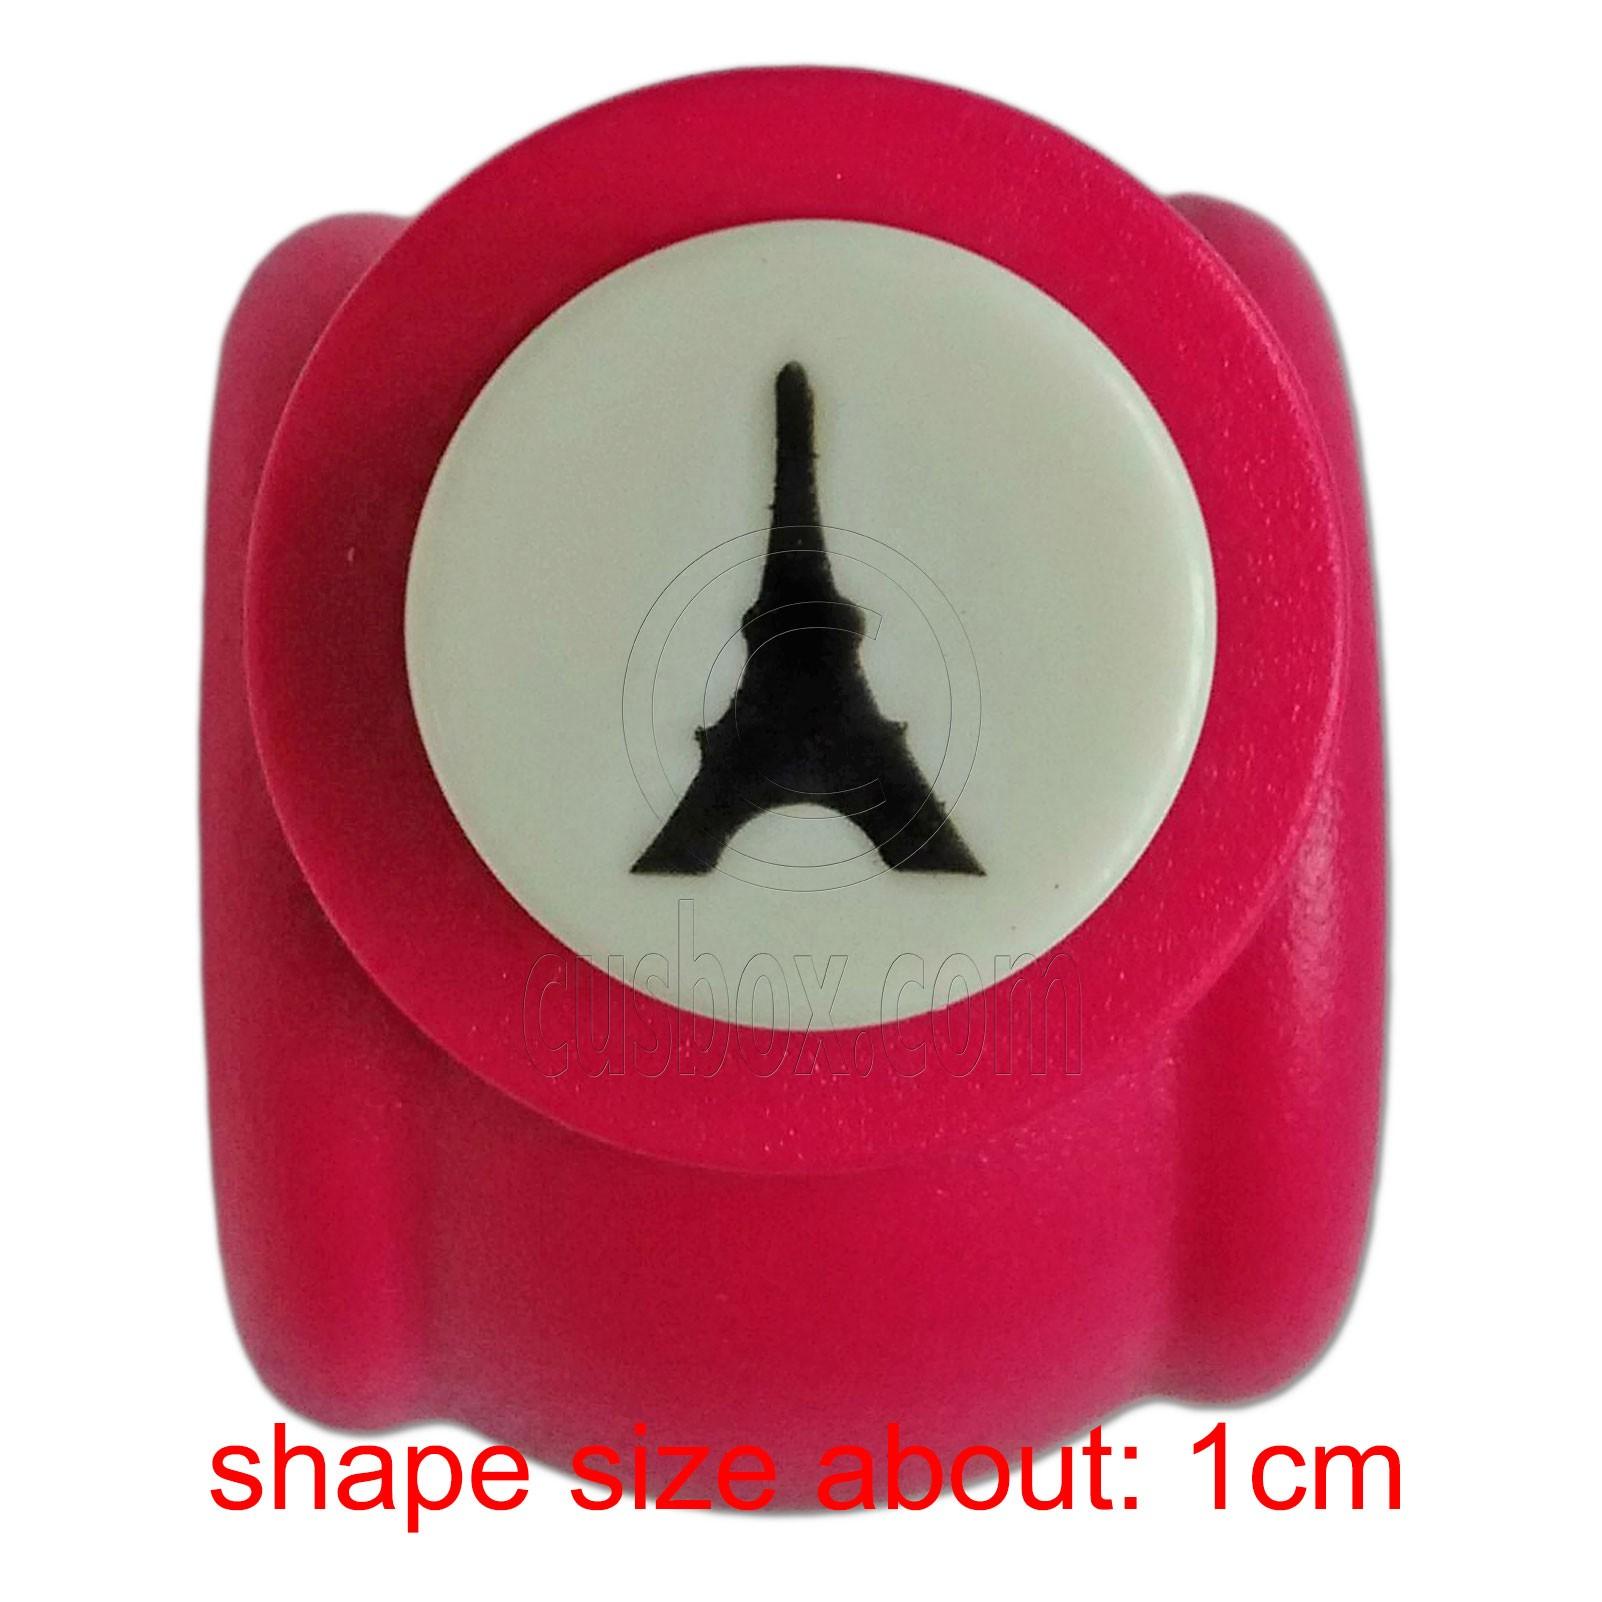 Scrapbook paper eiffel tower - Paris Eiffel Tower Travel Paper Edge Craft Punch Scrapbooking Die Cut Cutter 1cm